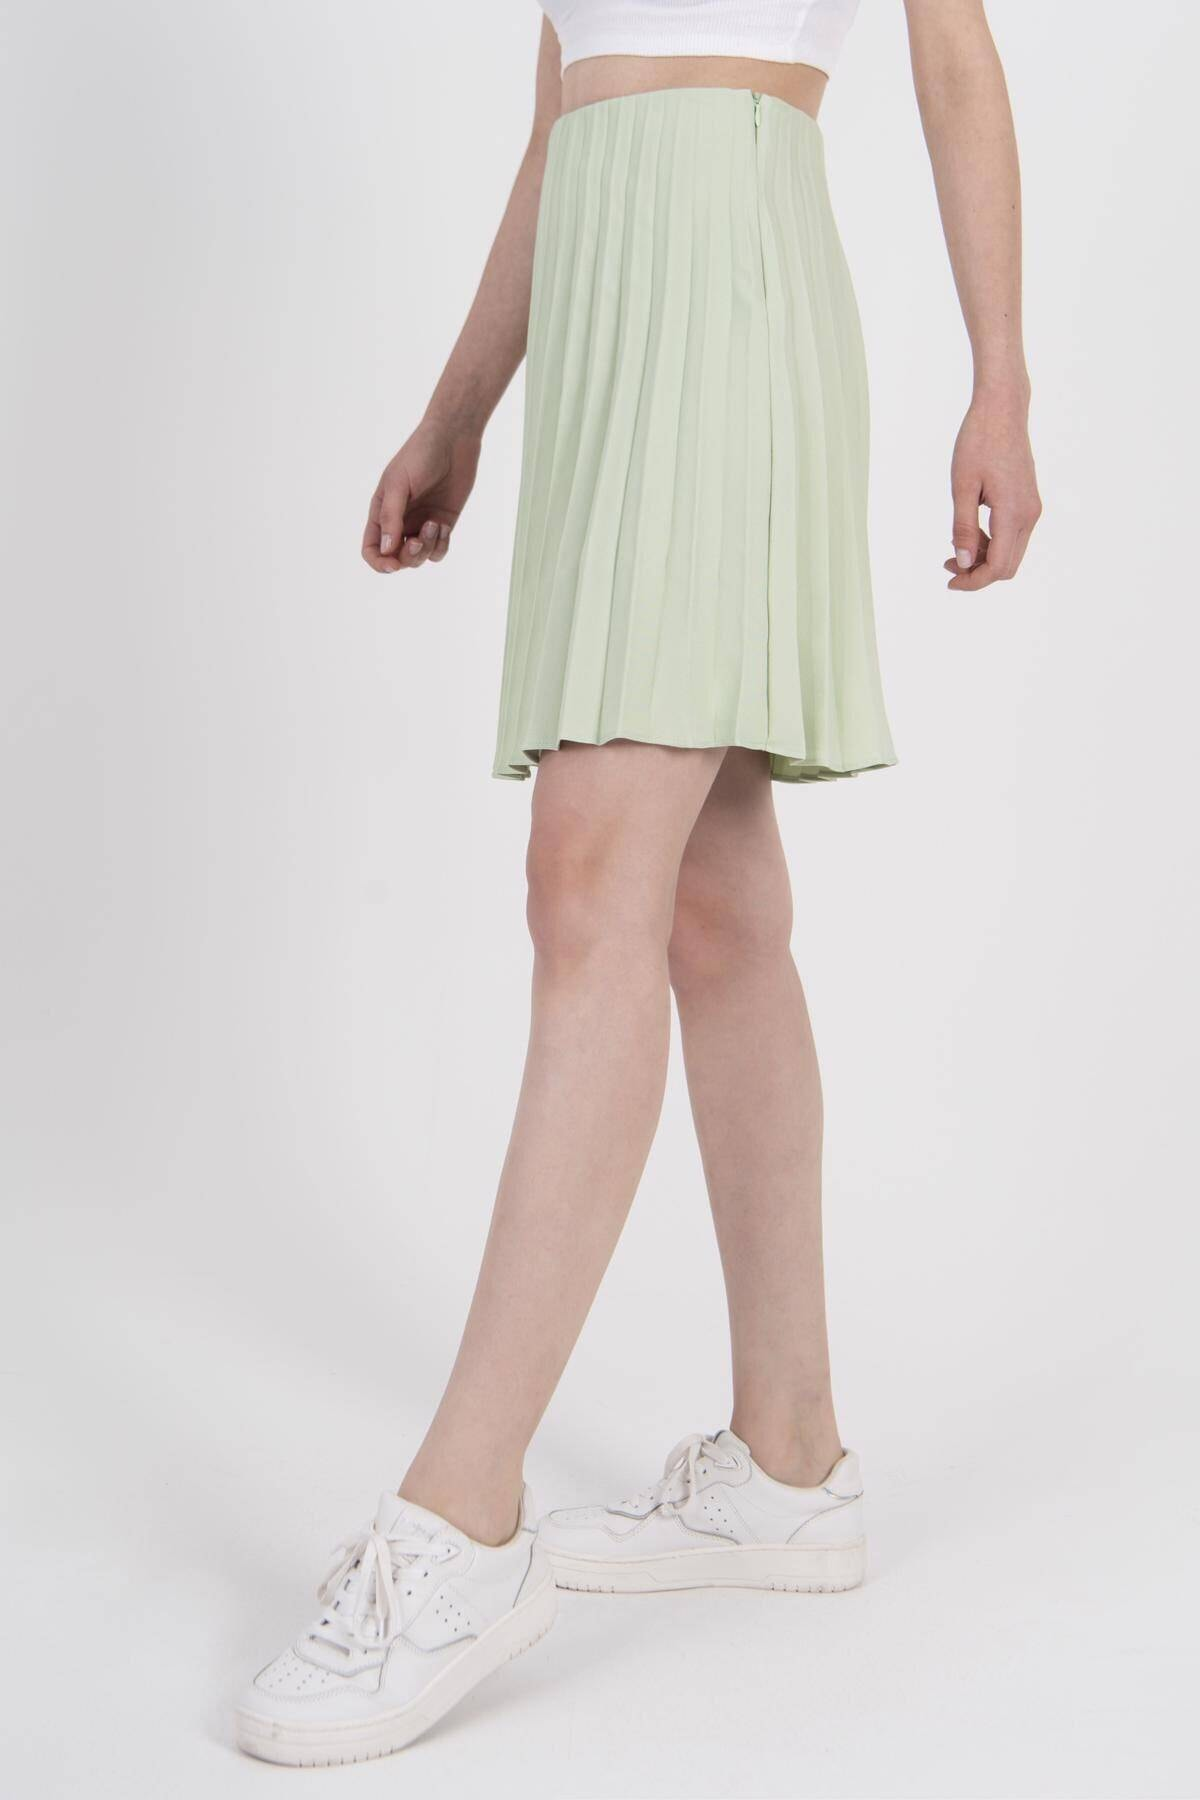 Addax Kadın Açık Mint Pileli Etek E1011 - L12 - L13 ADX-0000022635 2